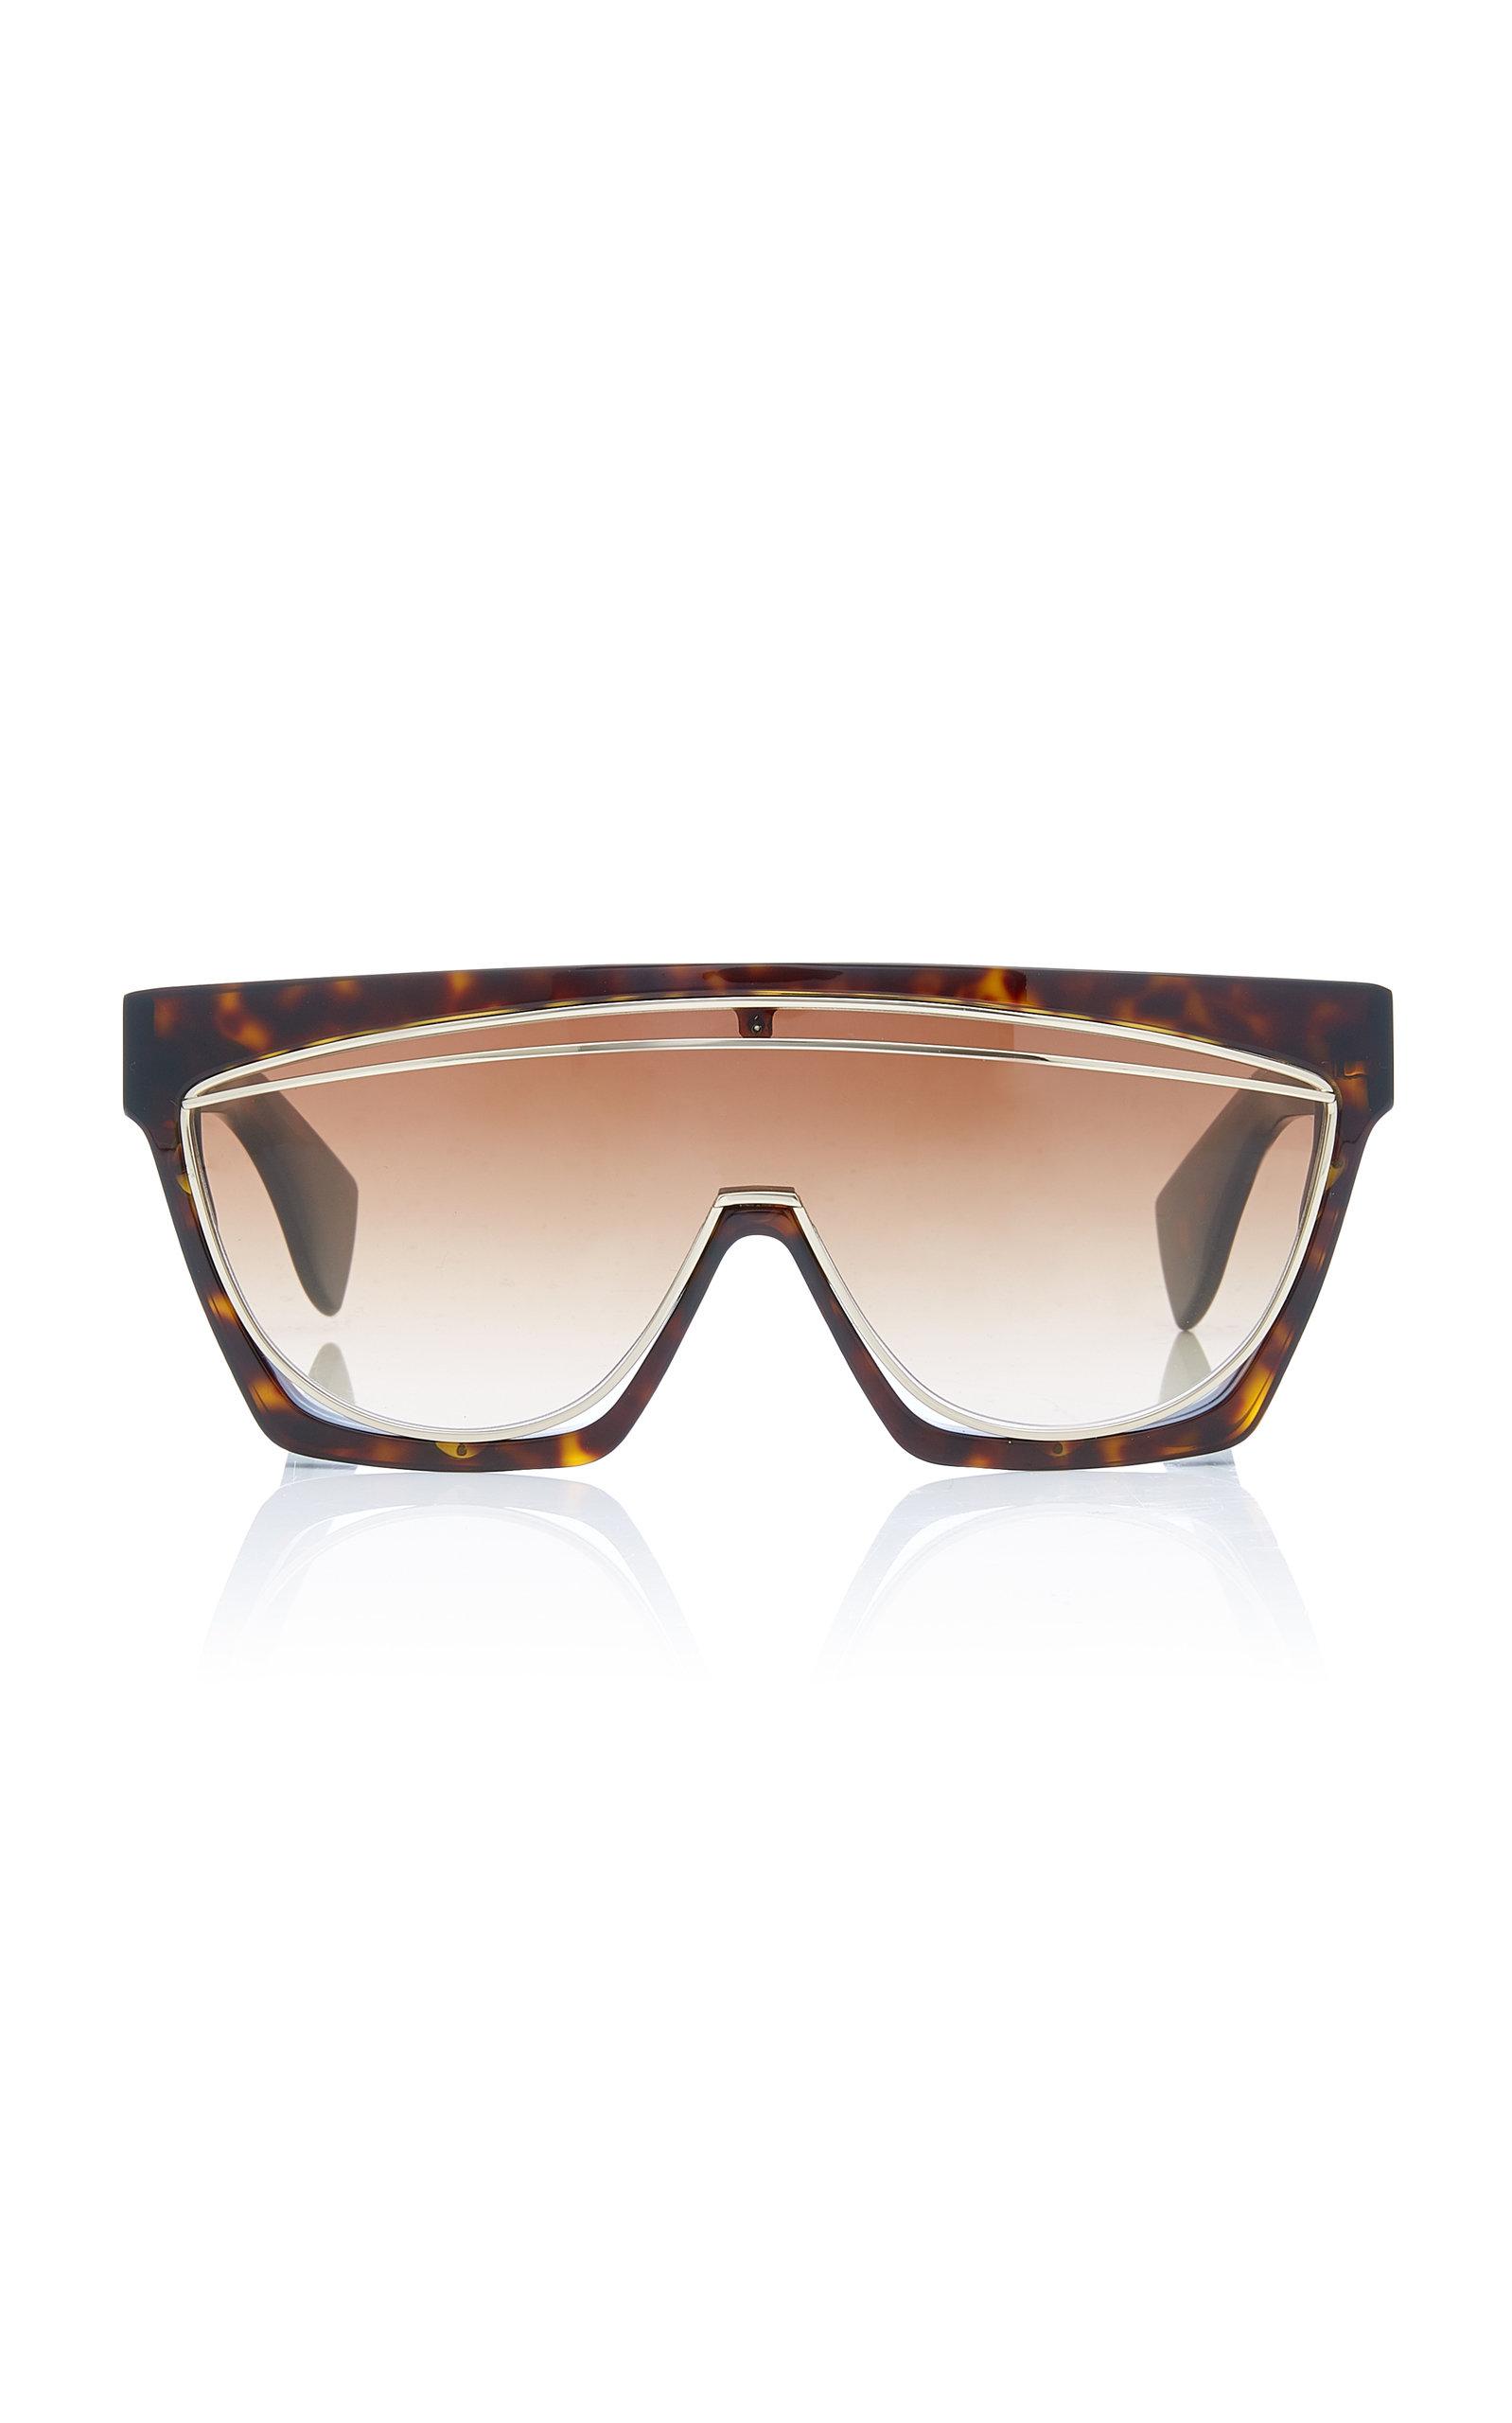 6d4dce82218 Loewe SunglassesMasque Tortoiseshell Acetate Sunglasses. CLOSE. Loading